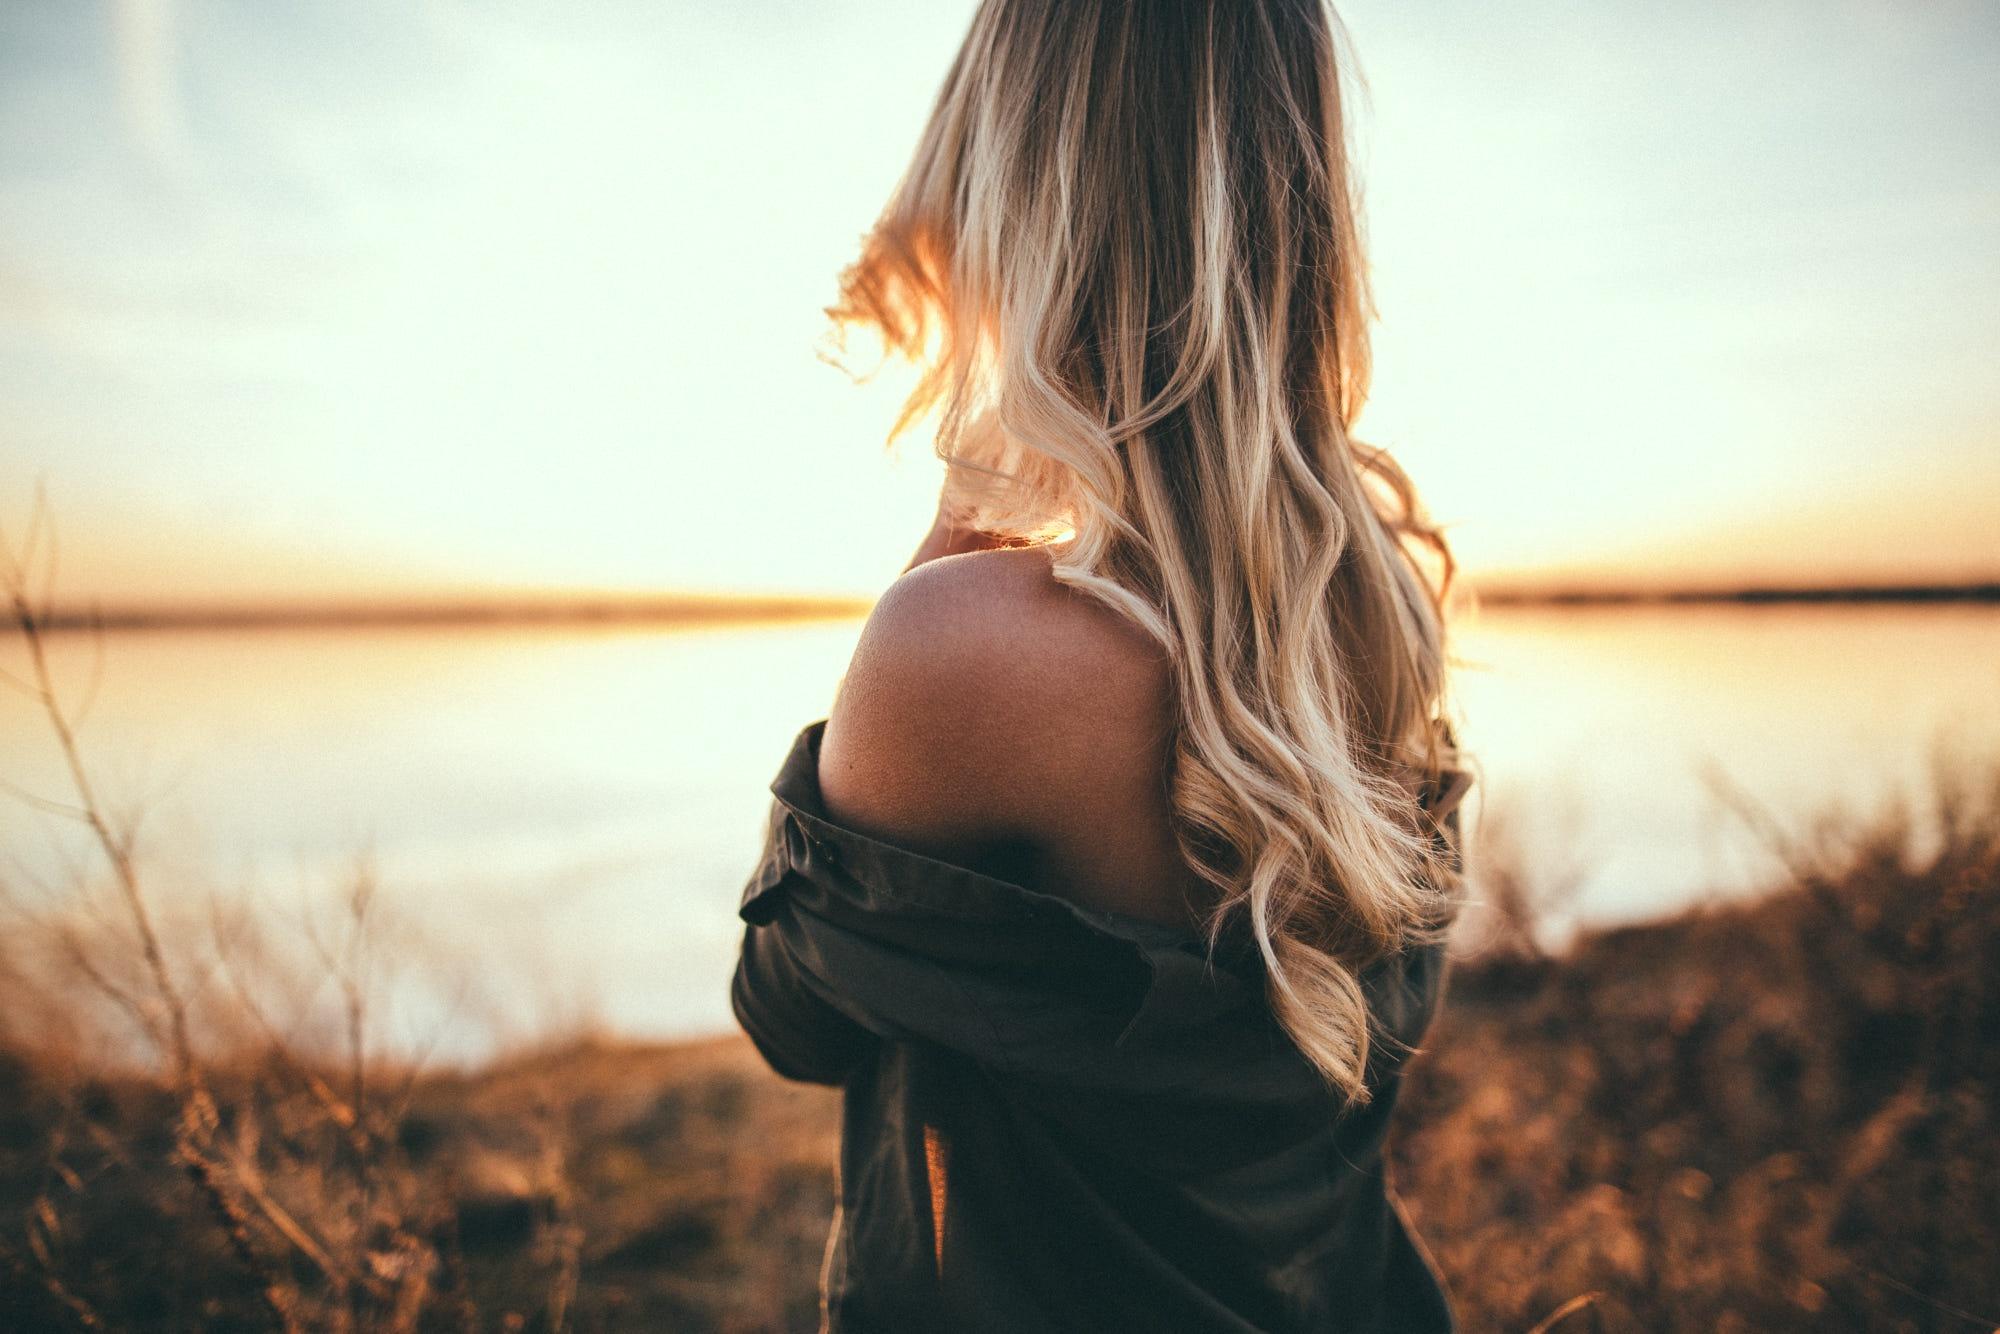 Картинка сзади девушки блондинки — pic 10